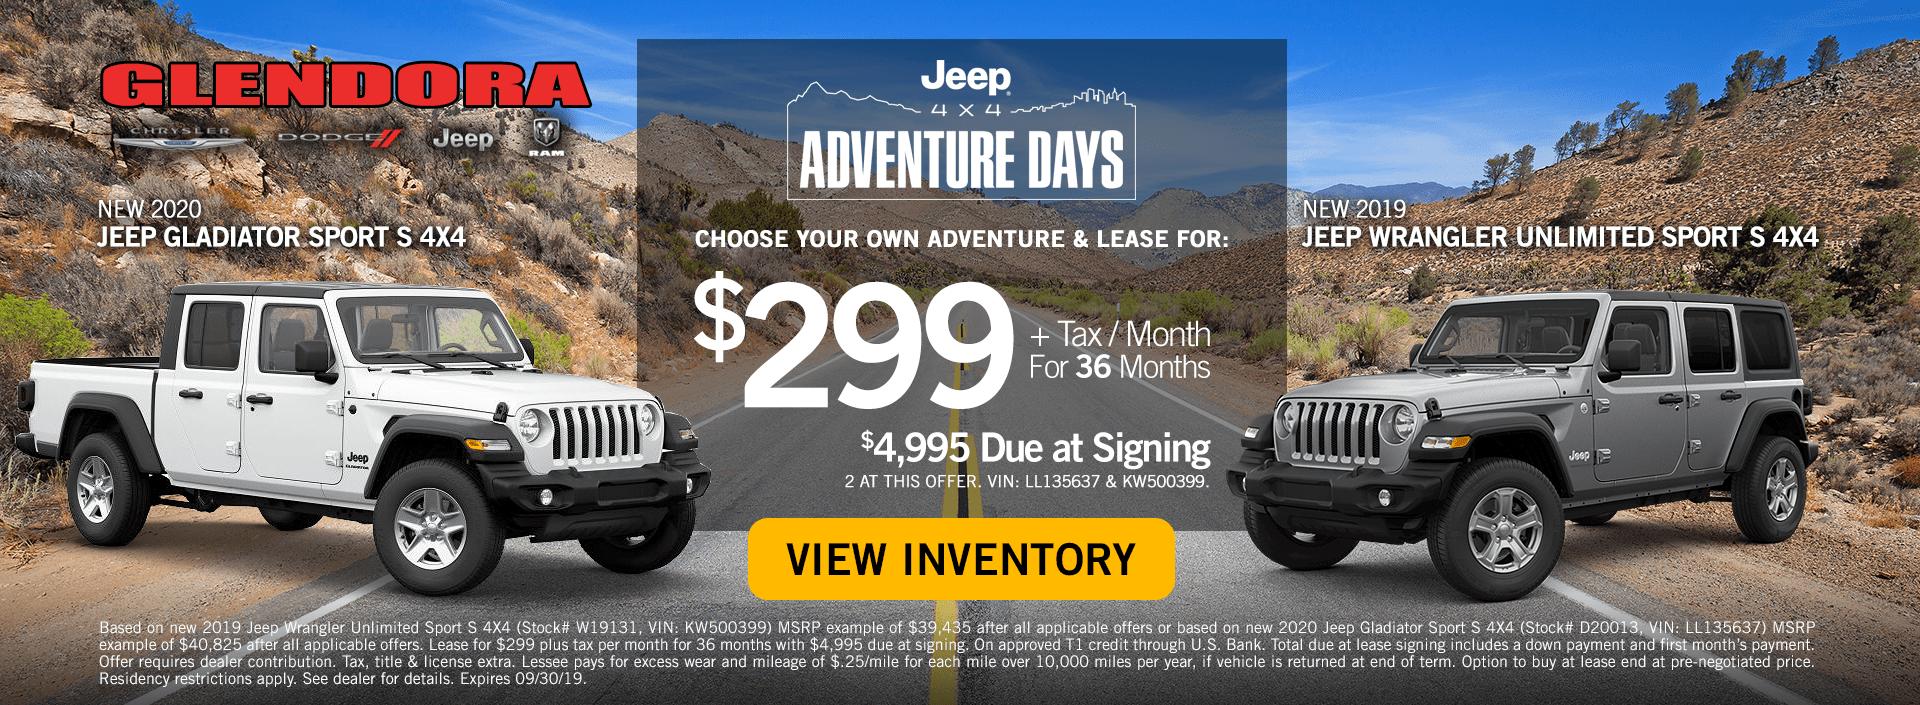 Jeep Adventure Days Special Jeep Gladiator vs Wrangler